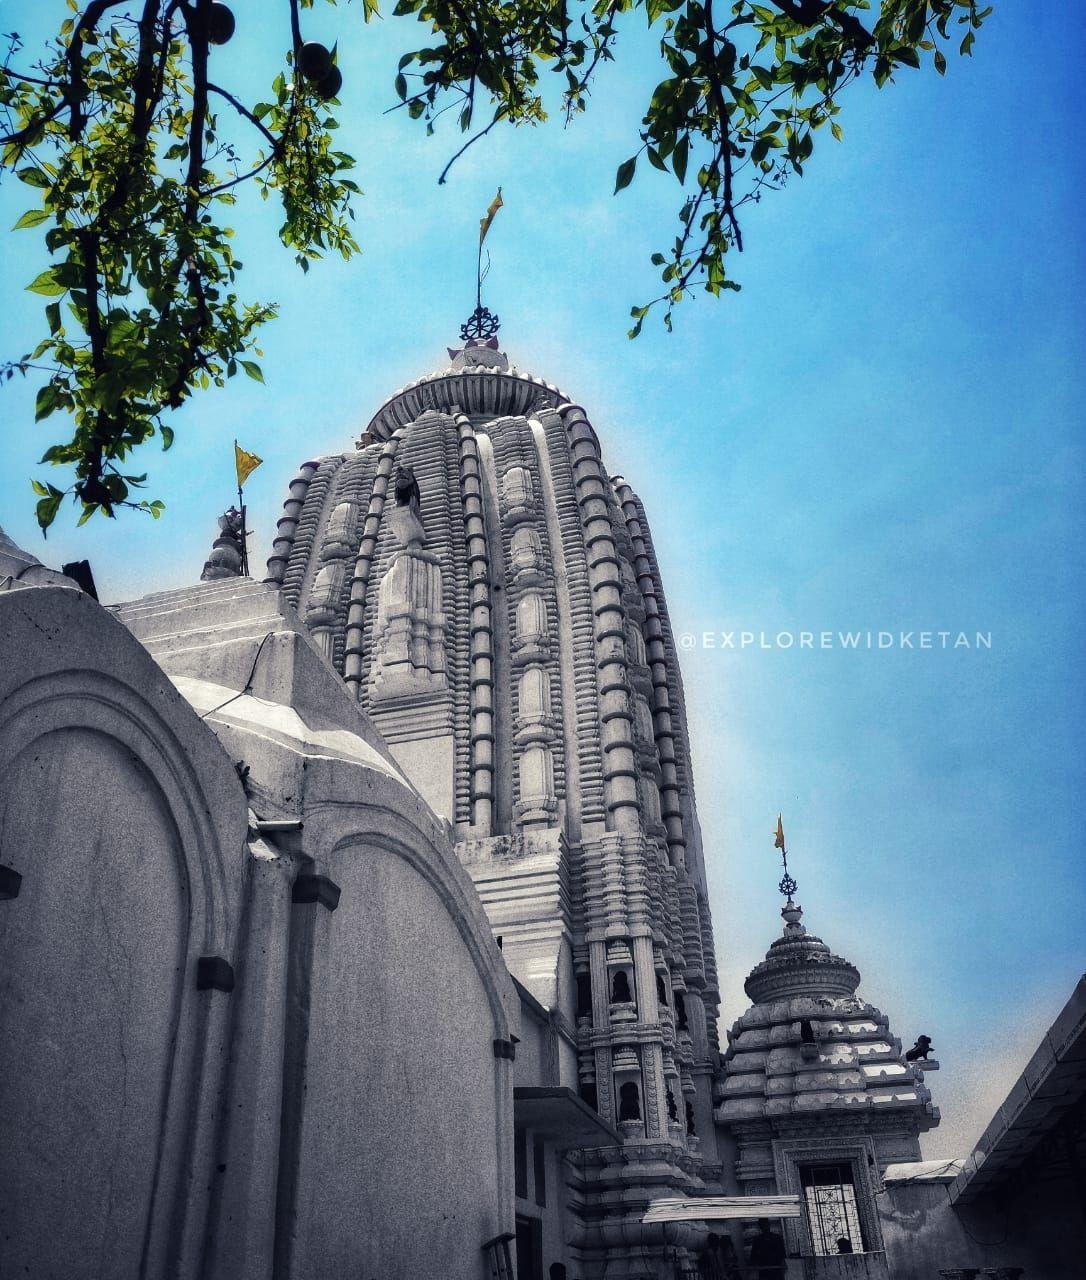 Photo of Jagannathpur By ExploreWidKetan